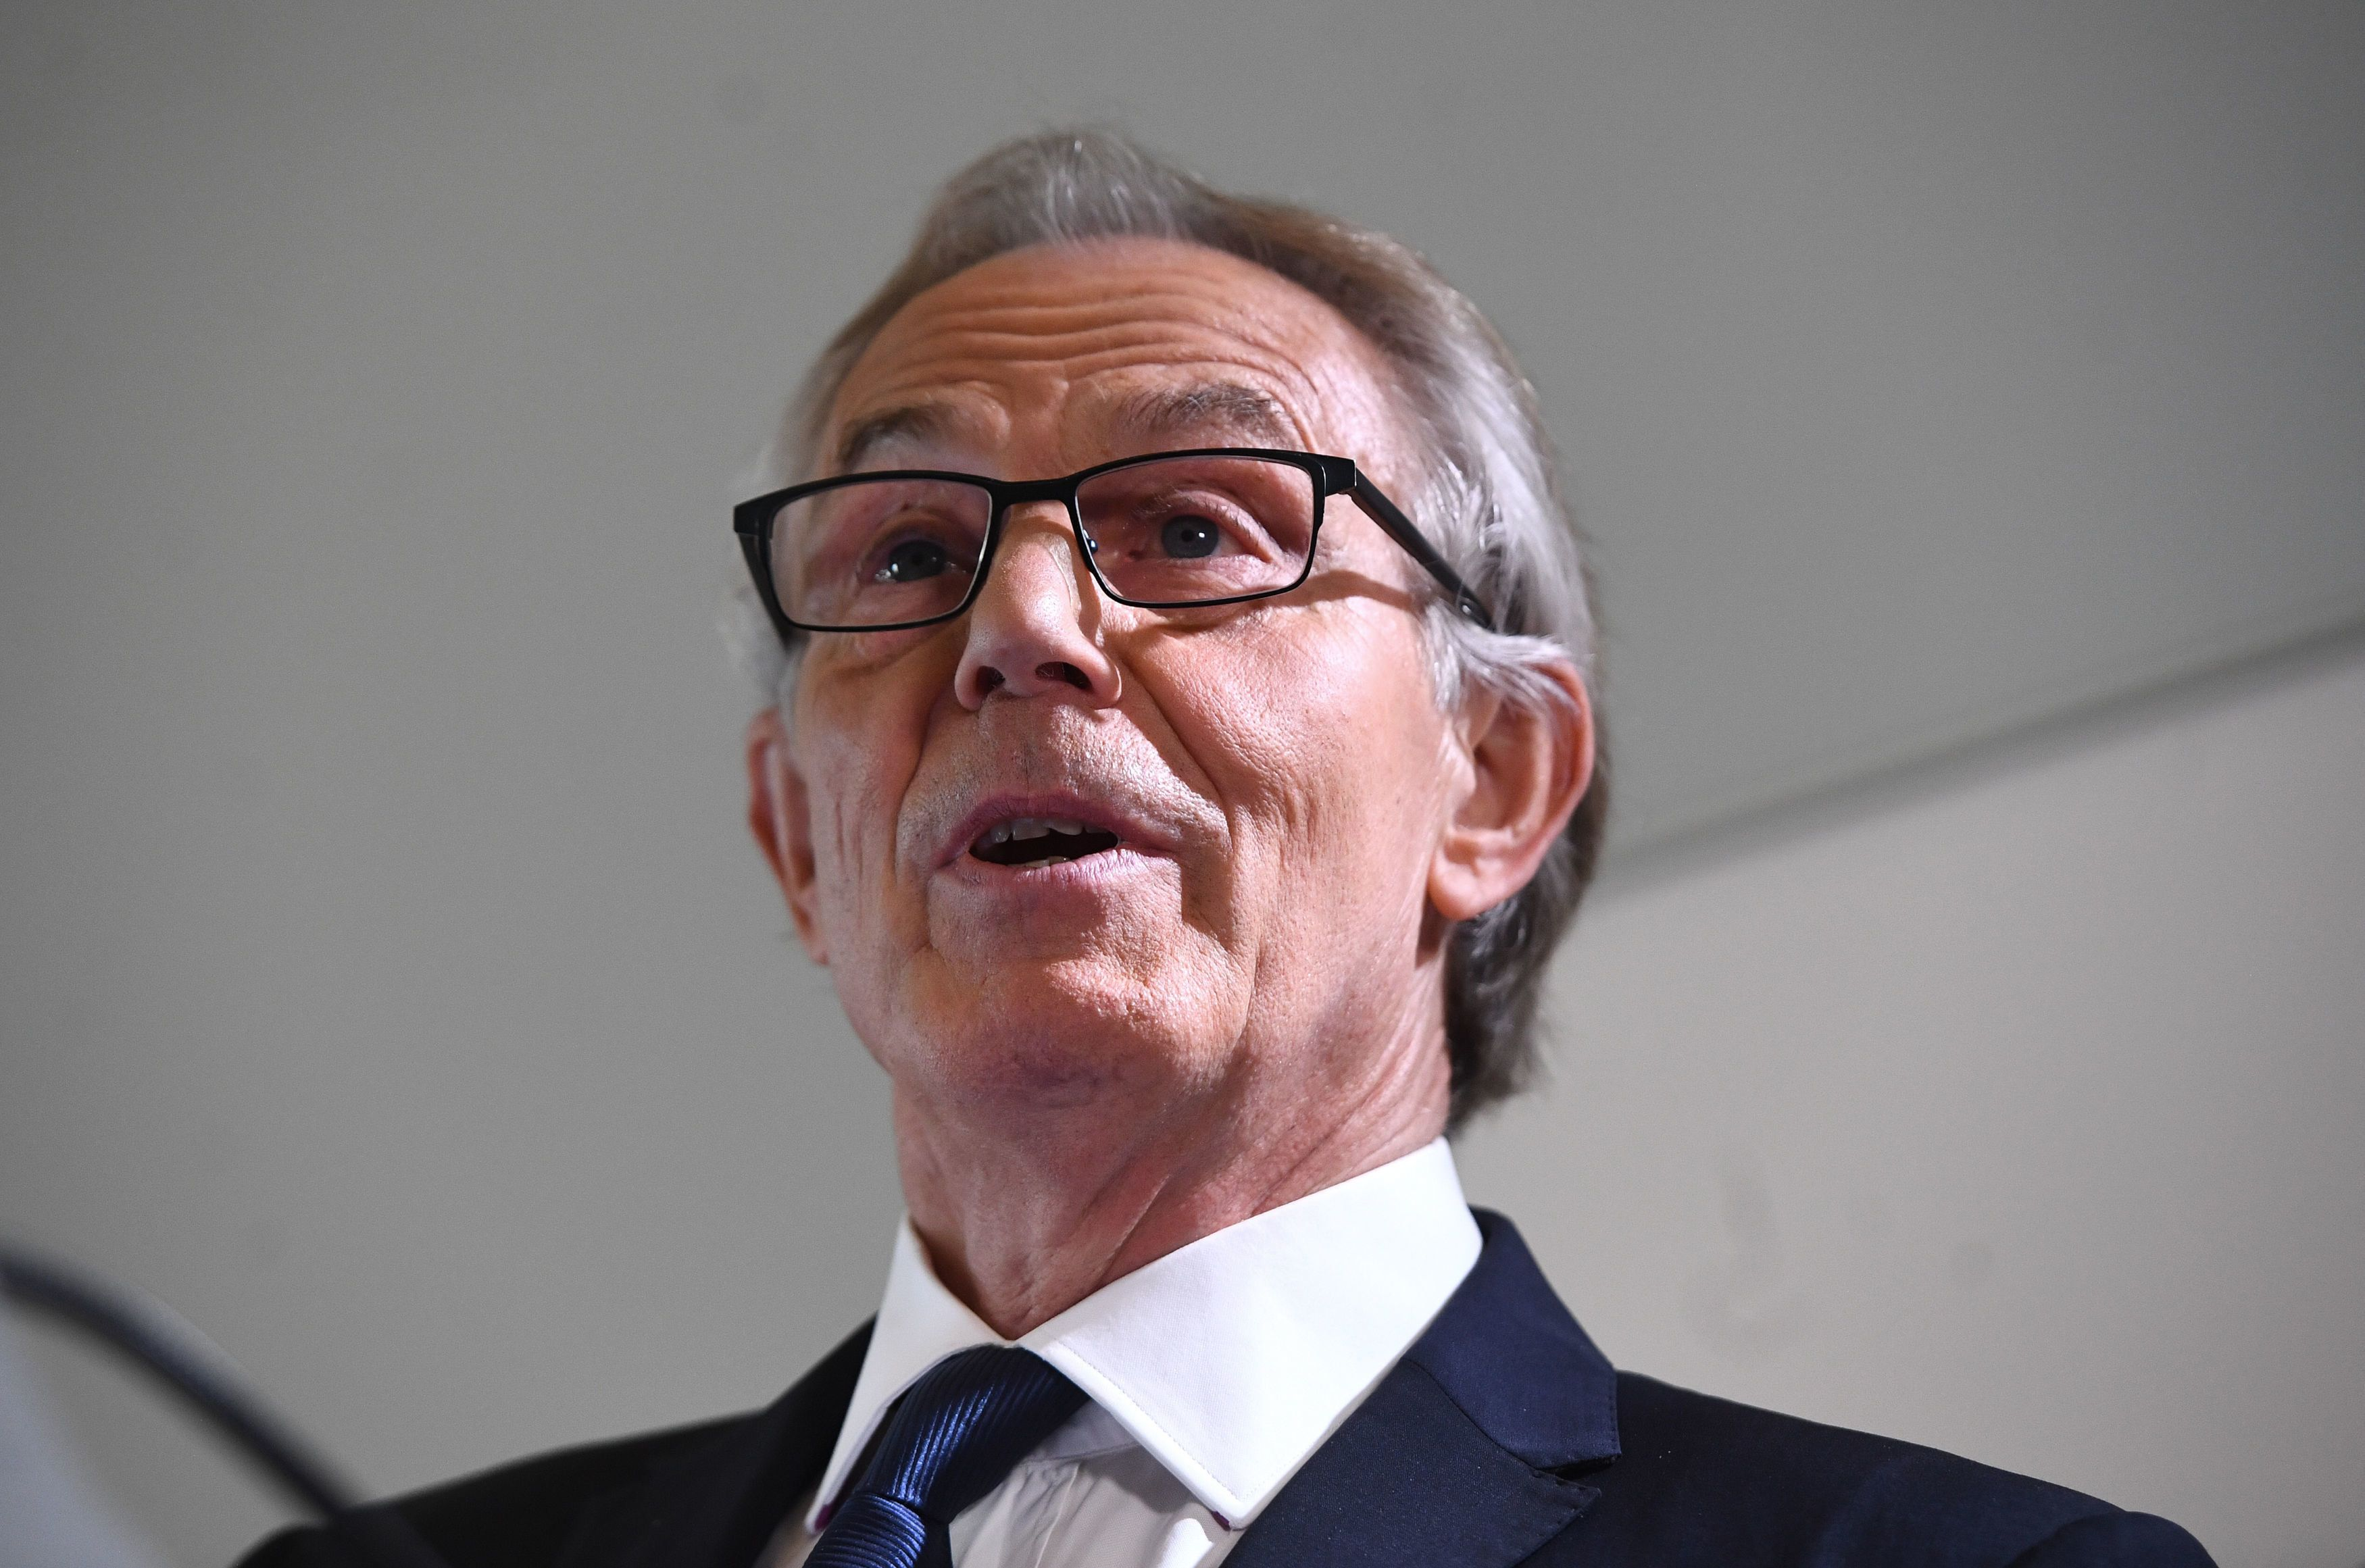 Former Labour prime minister Tony